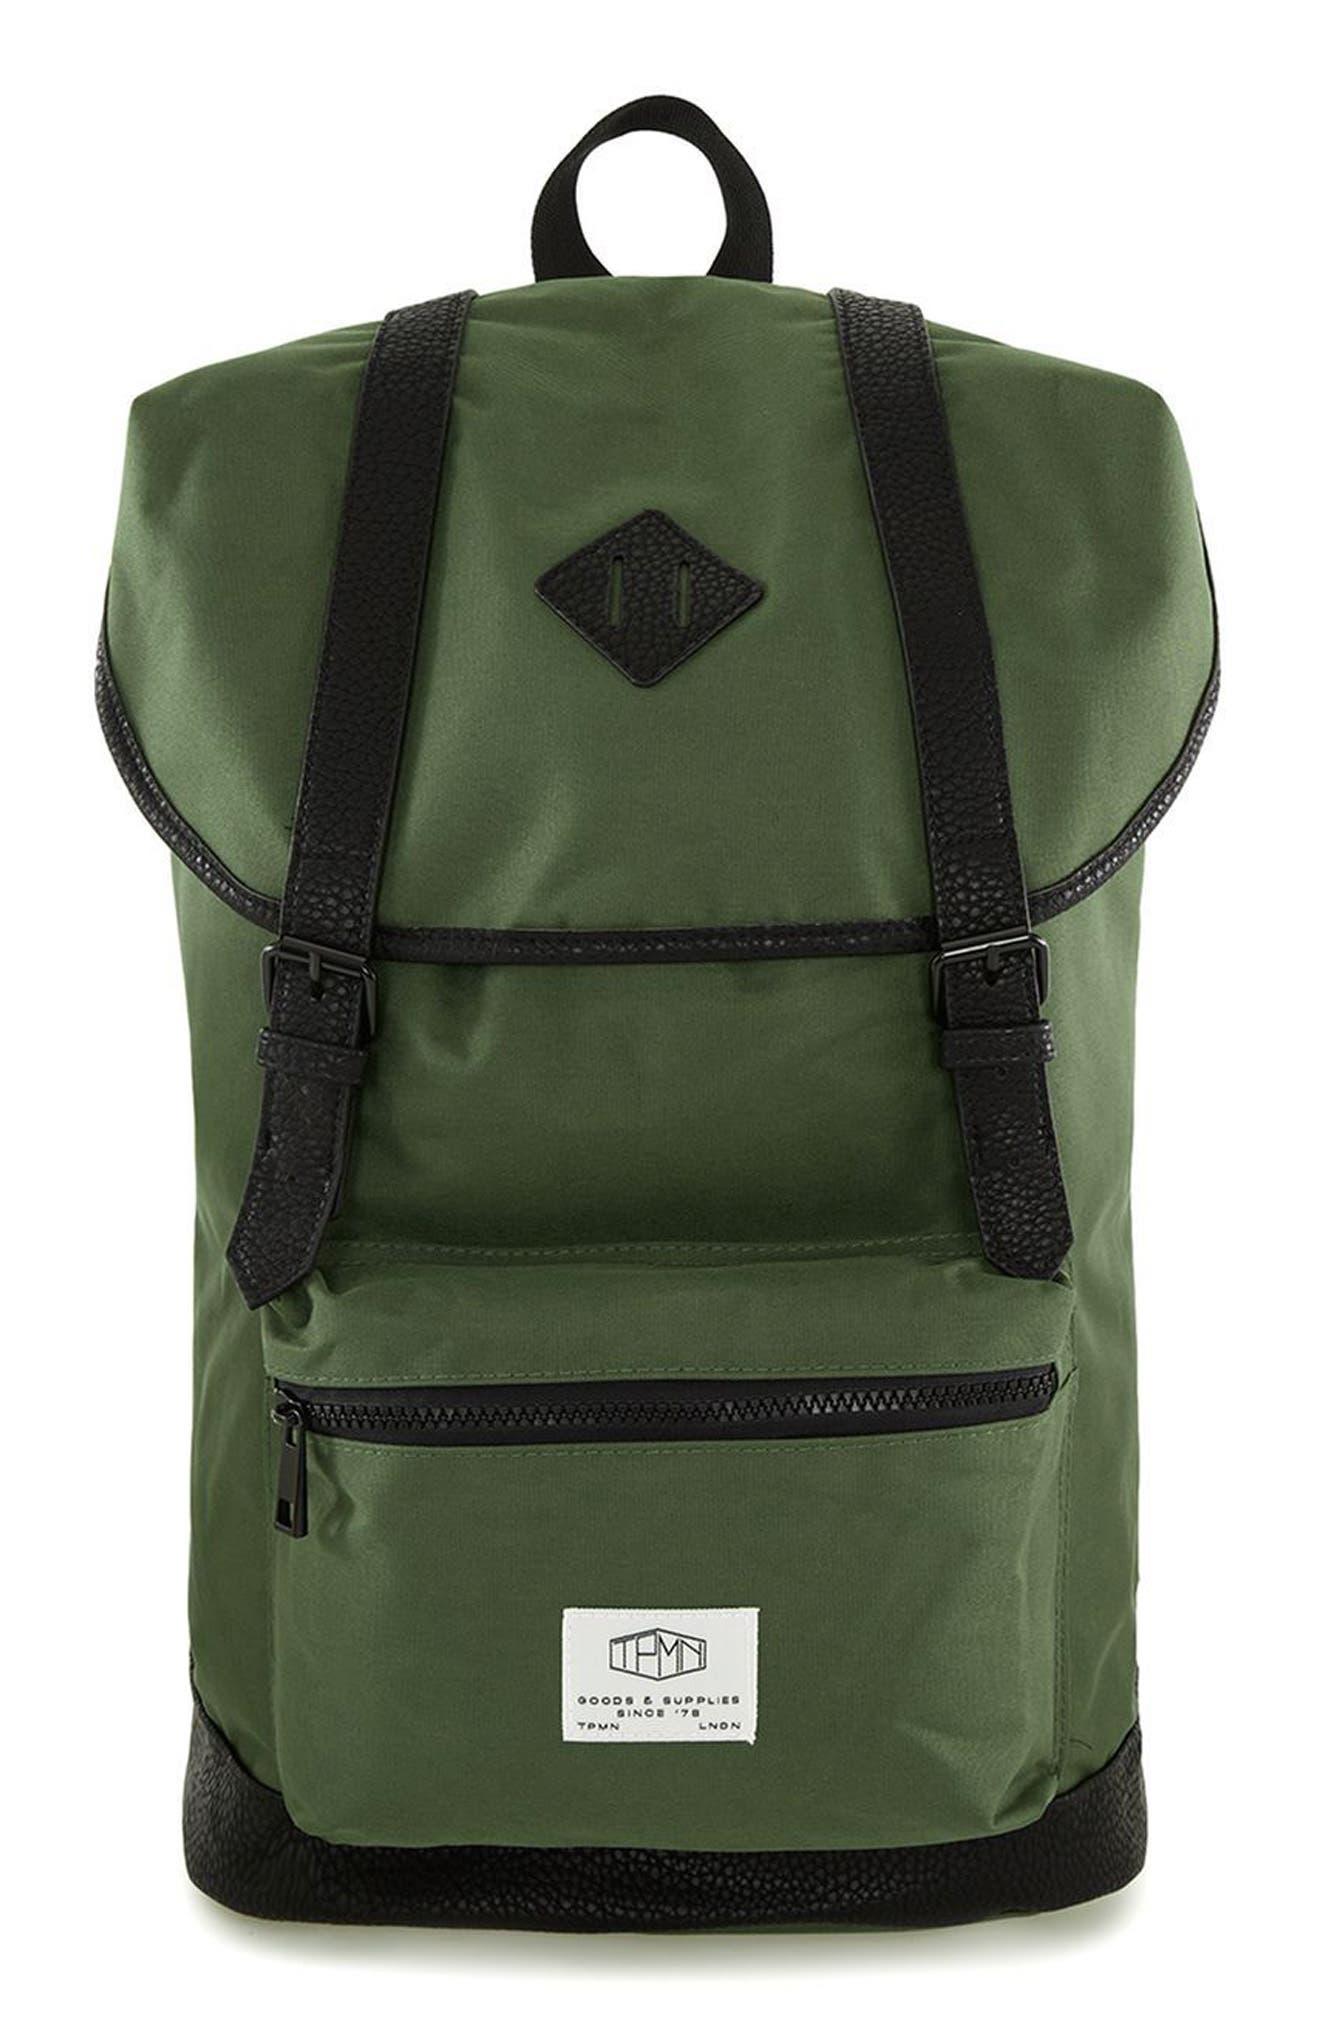 Explorer Flap Top Backpack,                             Main thumbnail 1, color,                             300